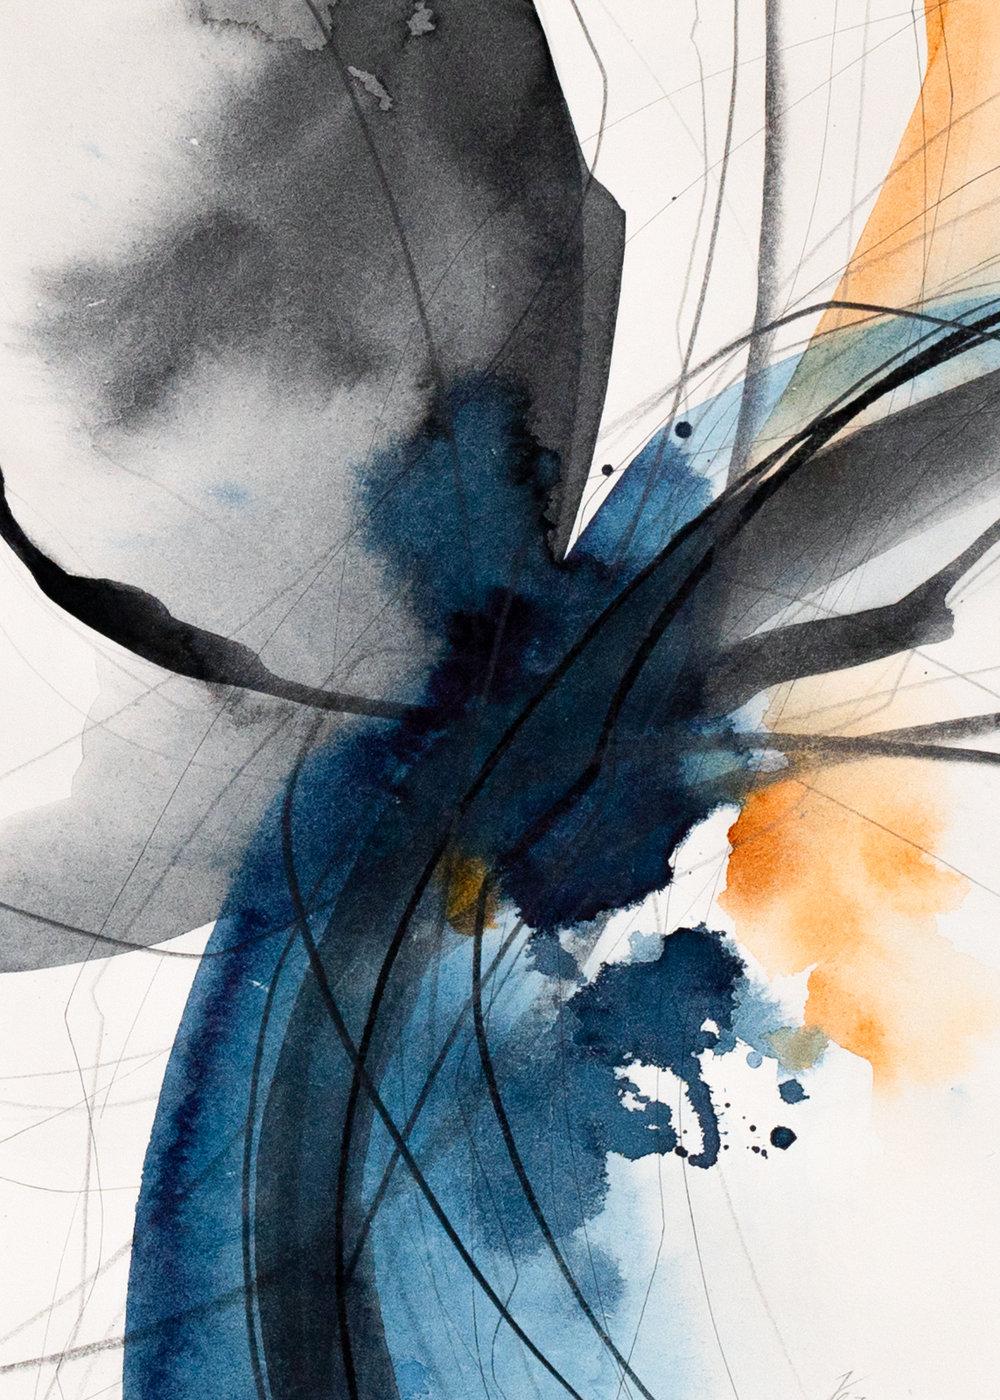 2018_Paintings_RebeccaRuetten_Rehe_2_1-9.jpg